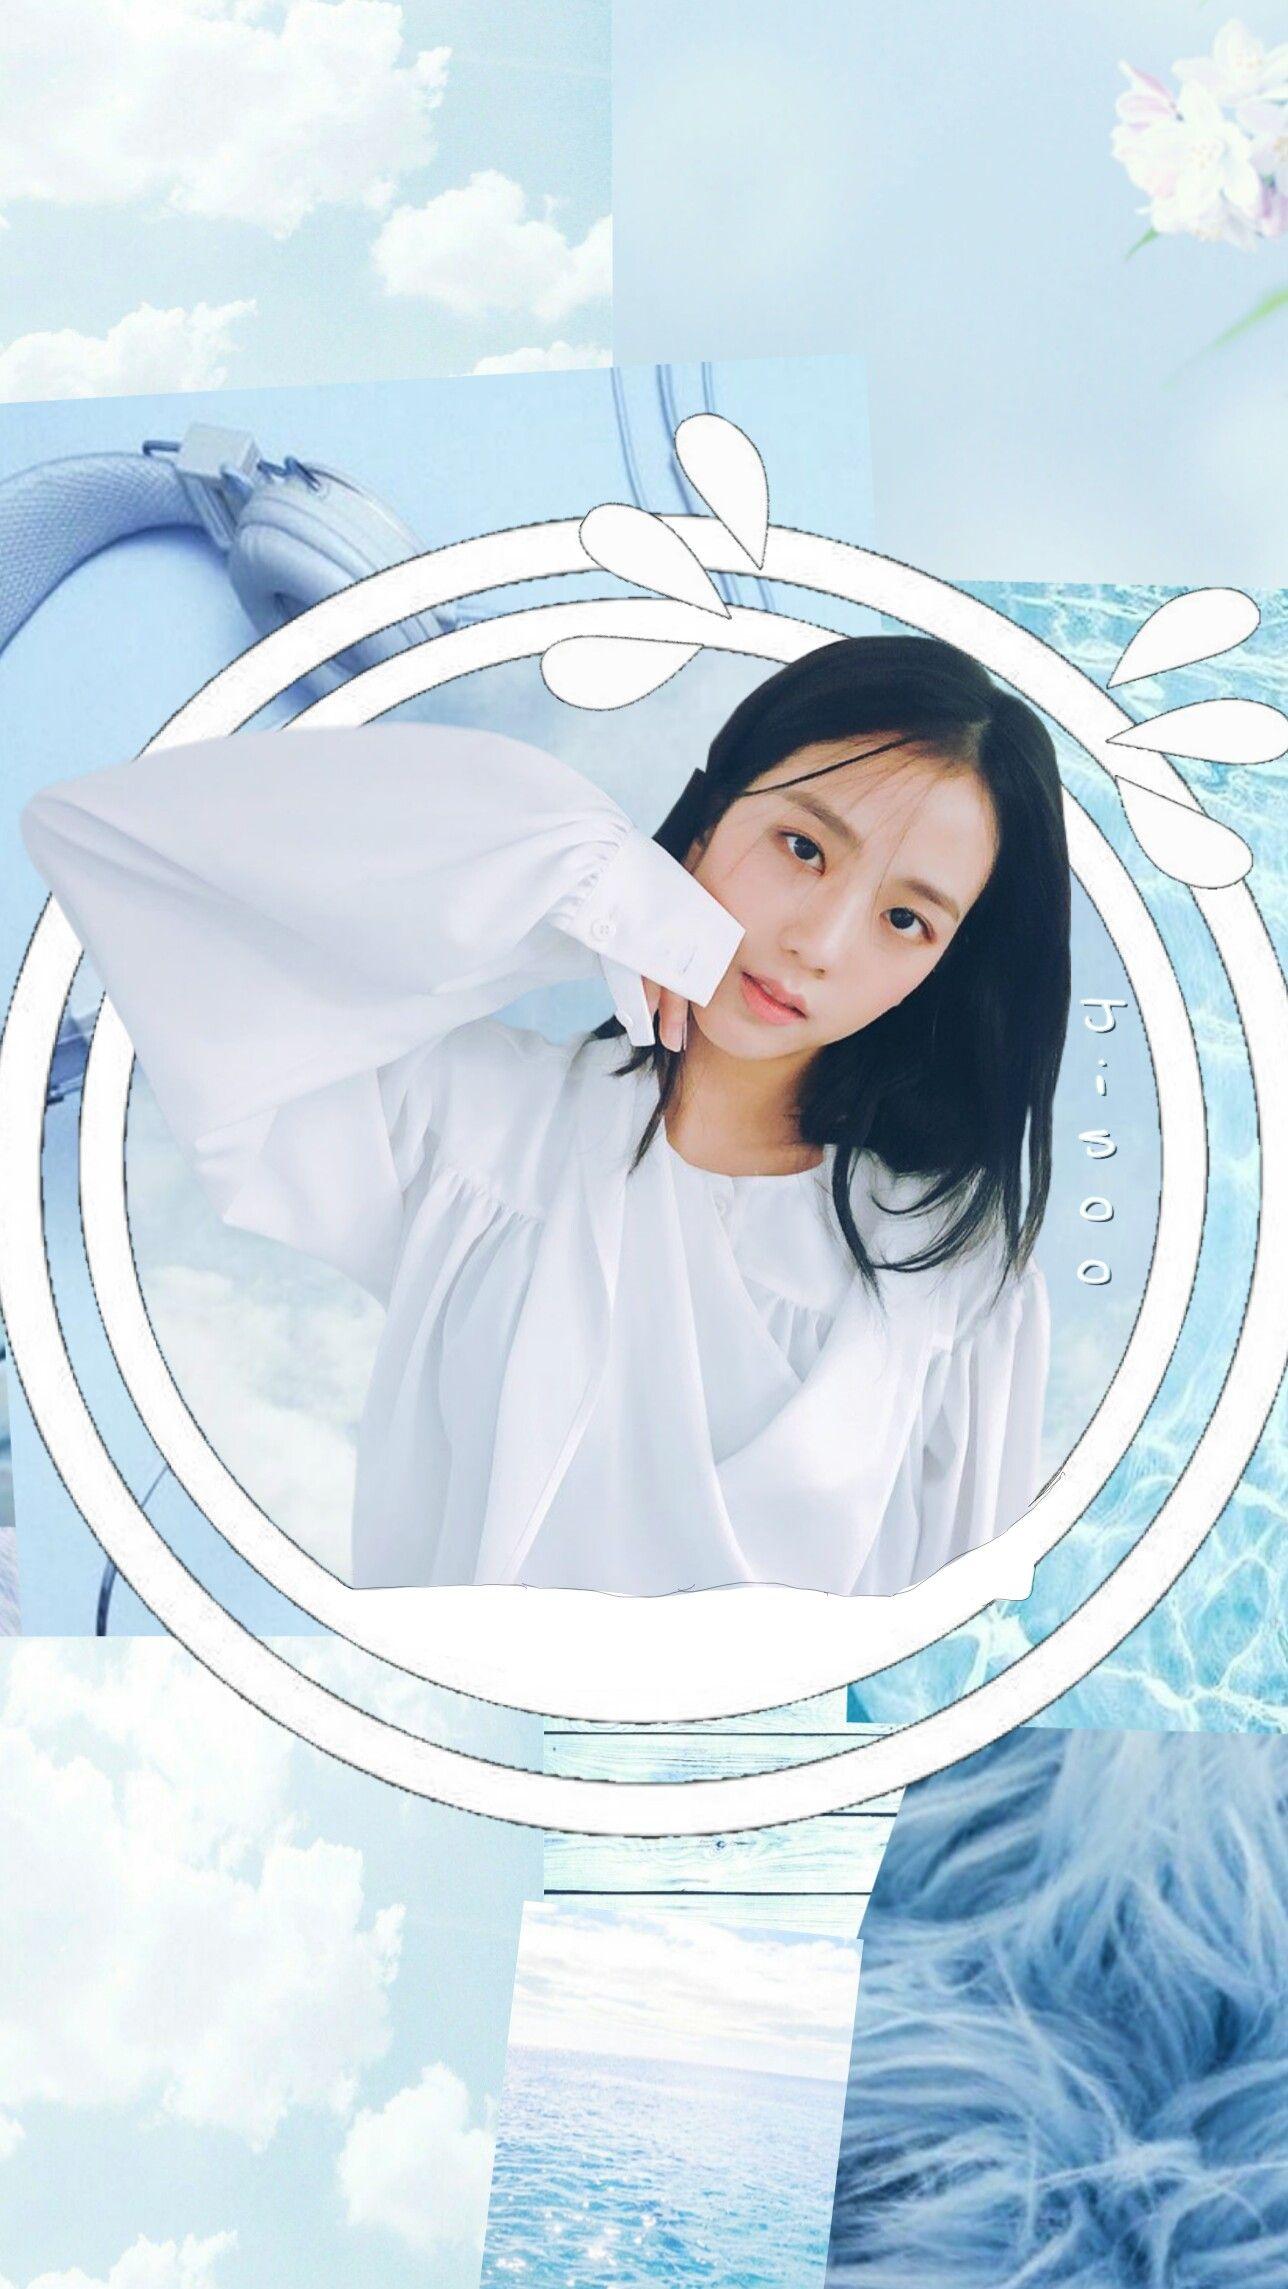 3 5 Tags Freetoedit Jisoo Kimjisoo Blackpink Blue Bluegirl Girl Blueaesthetic Aesthet Blue Aesthetic Pastel Blue Aesthetic Blue Wallpapers